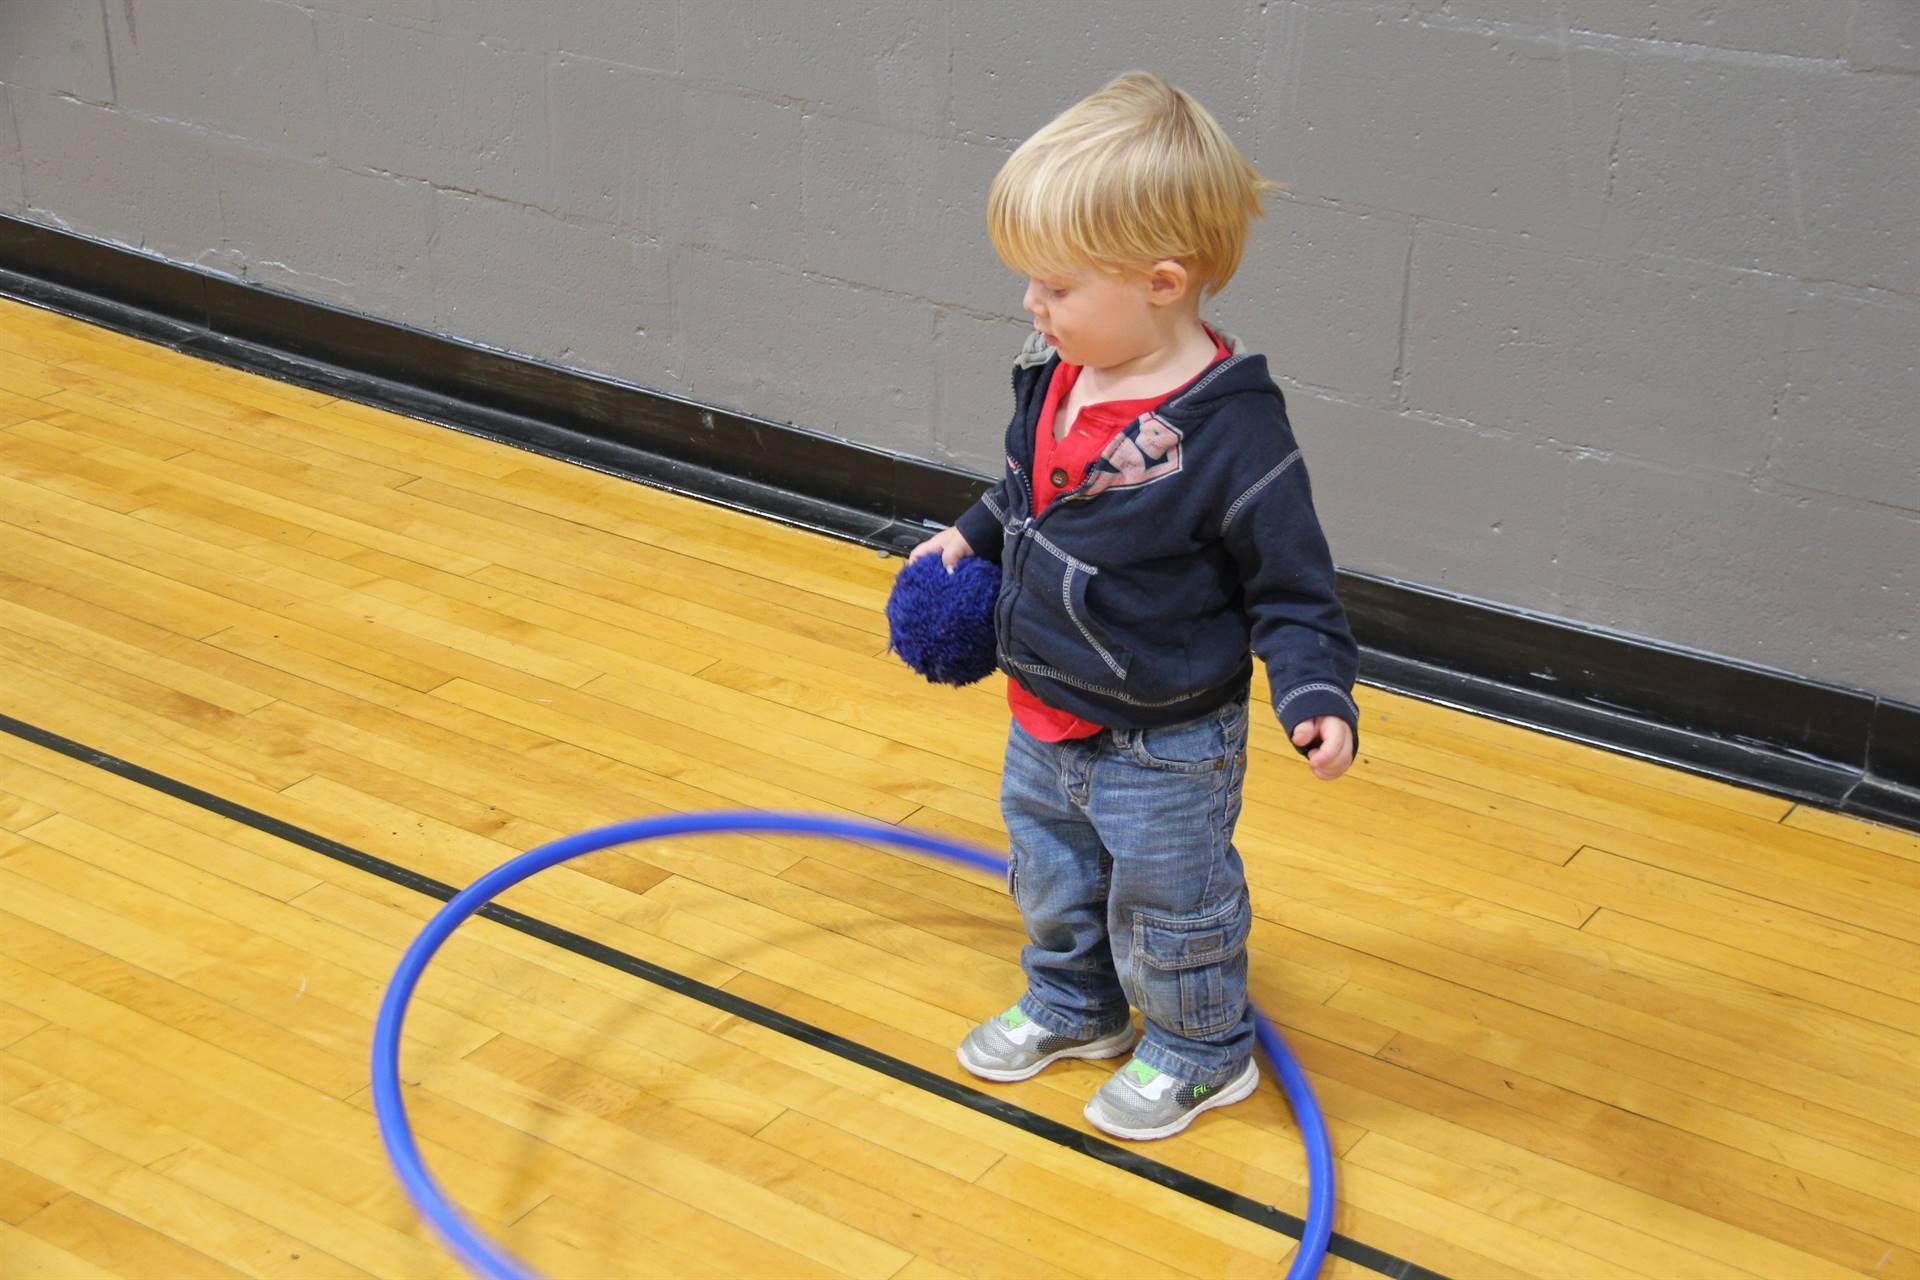 little boy hula hoops while wearing a ball